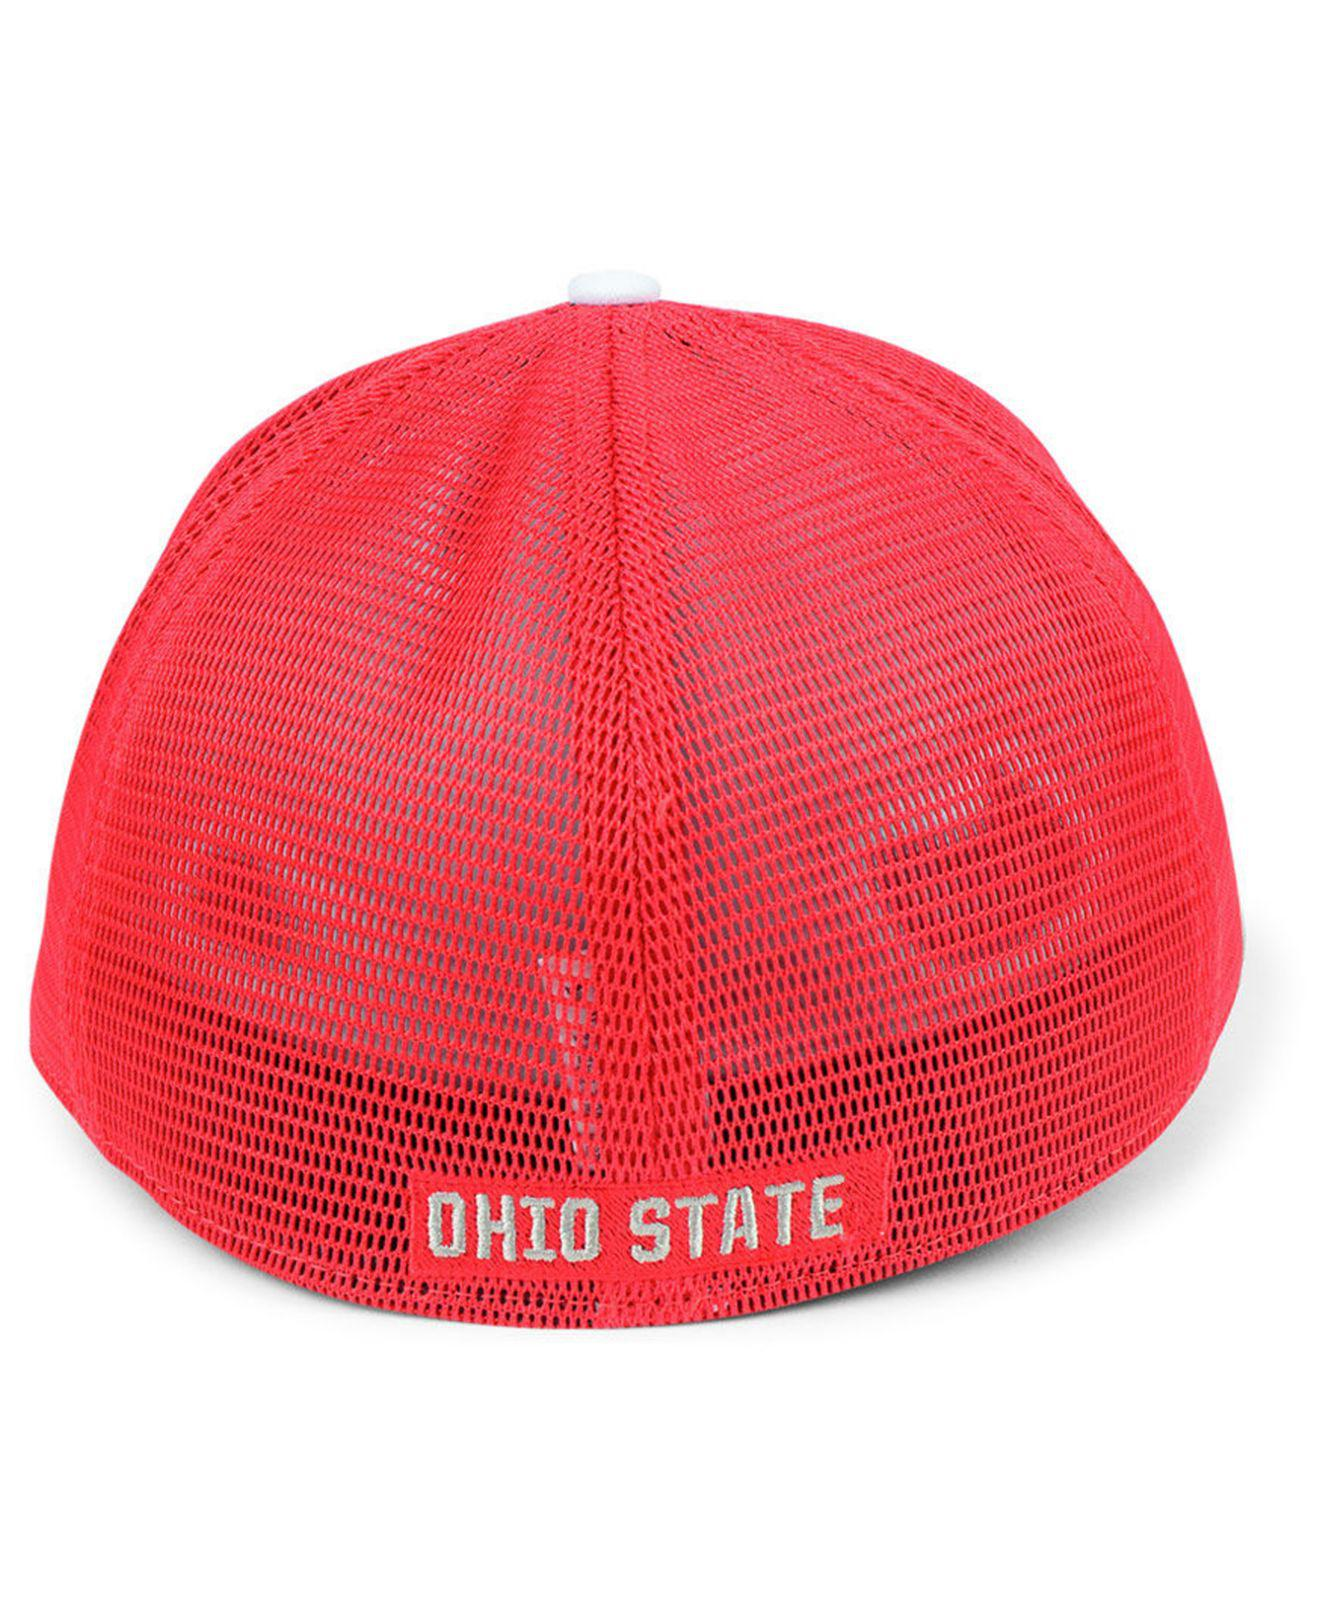 the latest 6bcb6 c39c1 cheap lyst nike ohio state buckeyes col aro swooshflex cap in red for men  1ec46 94a1b